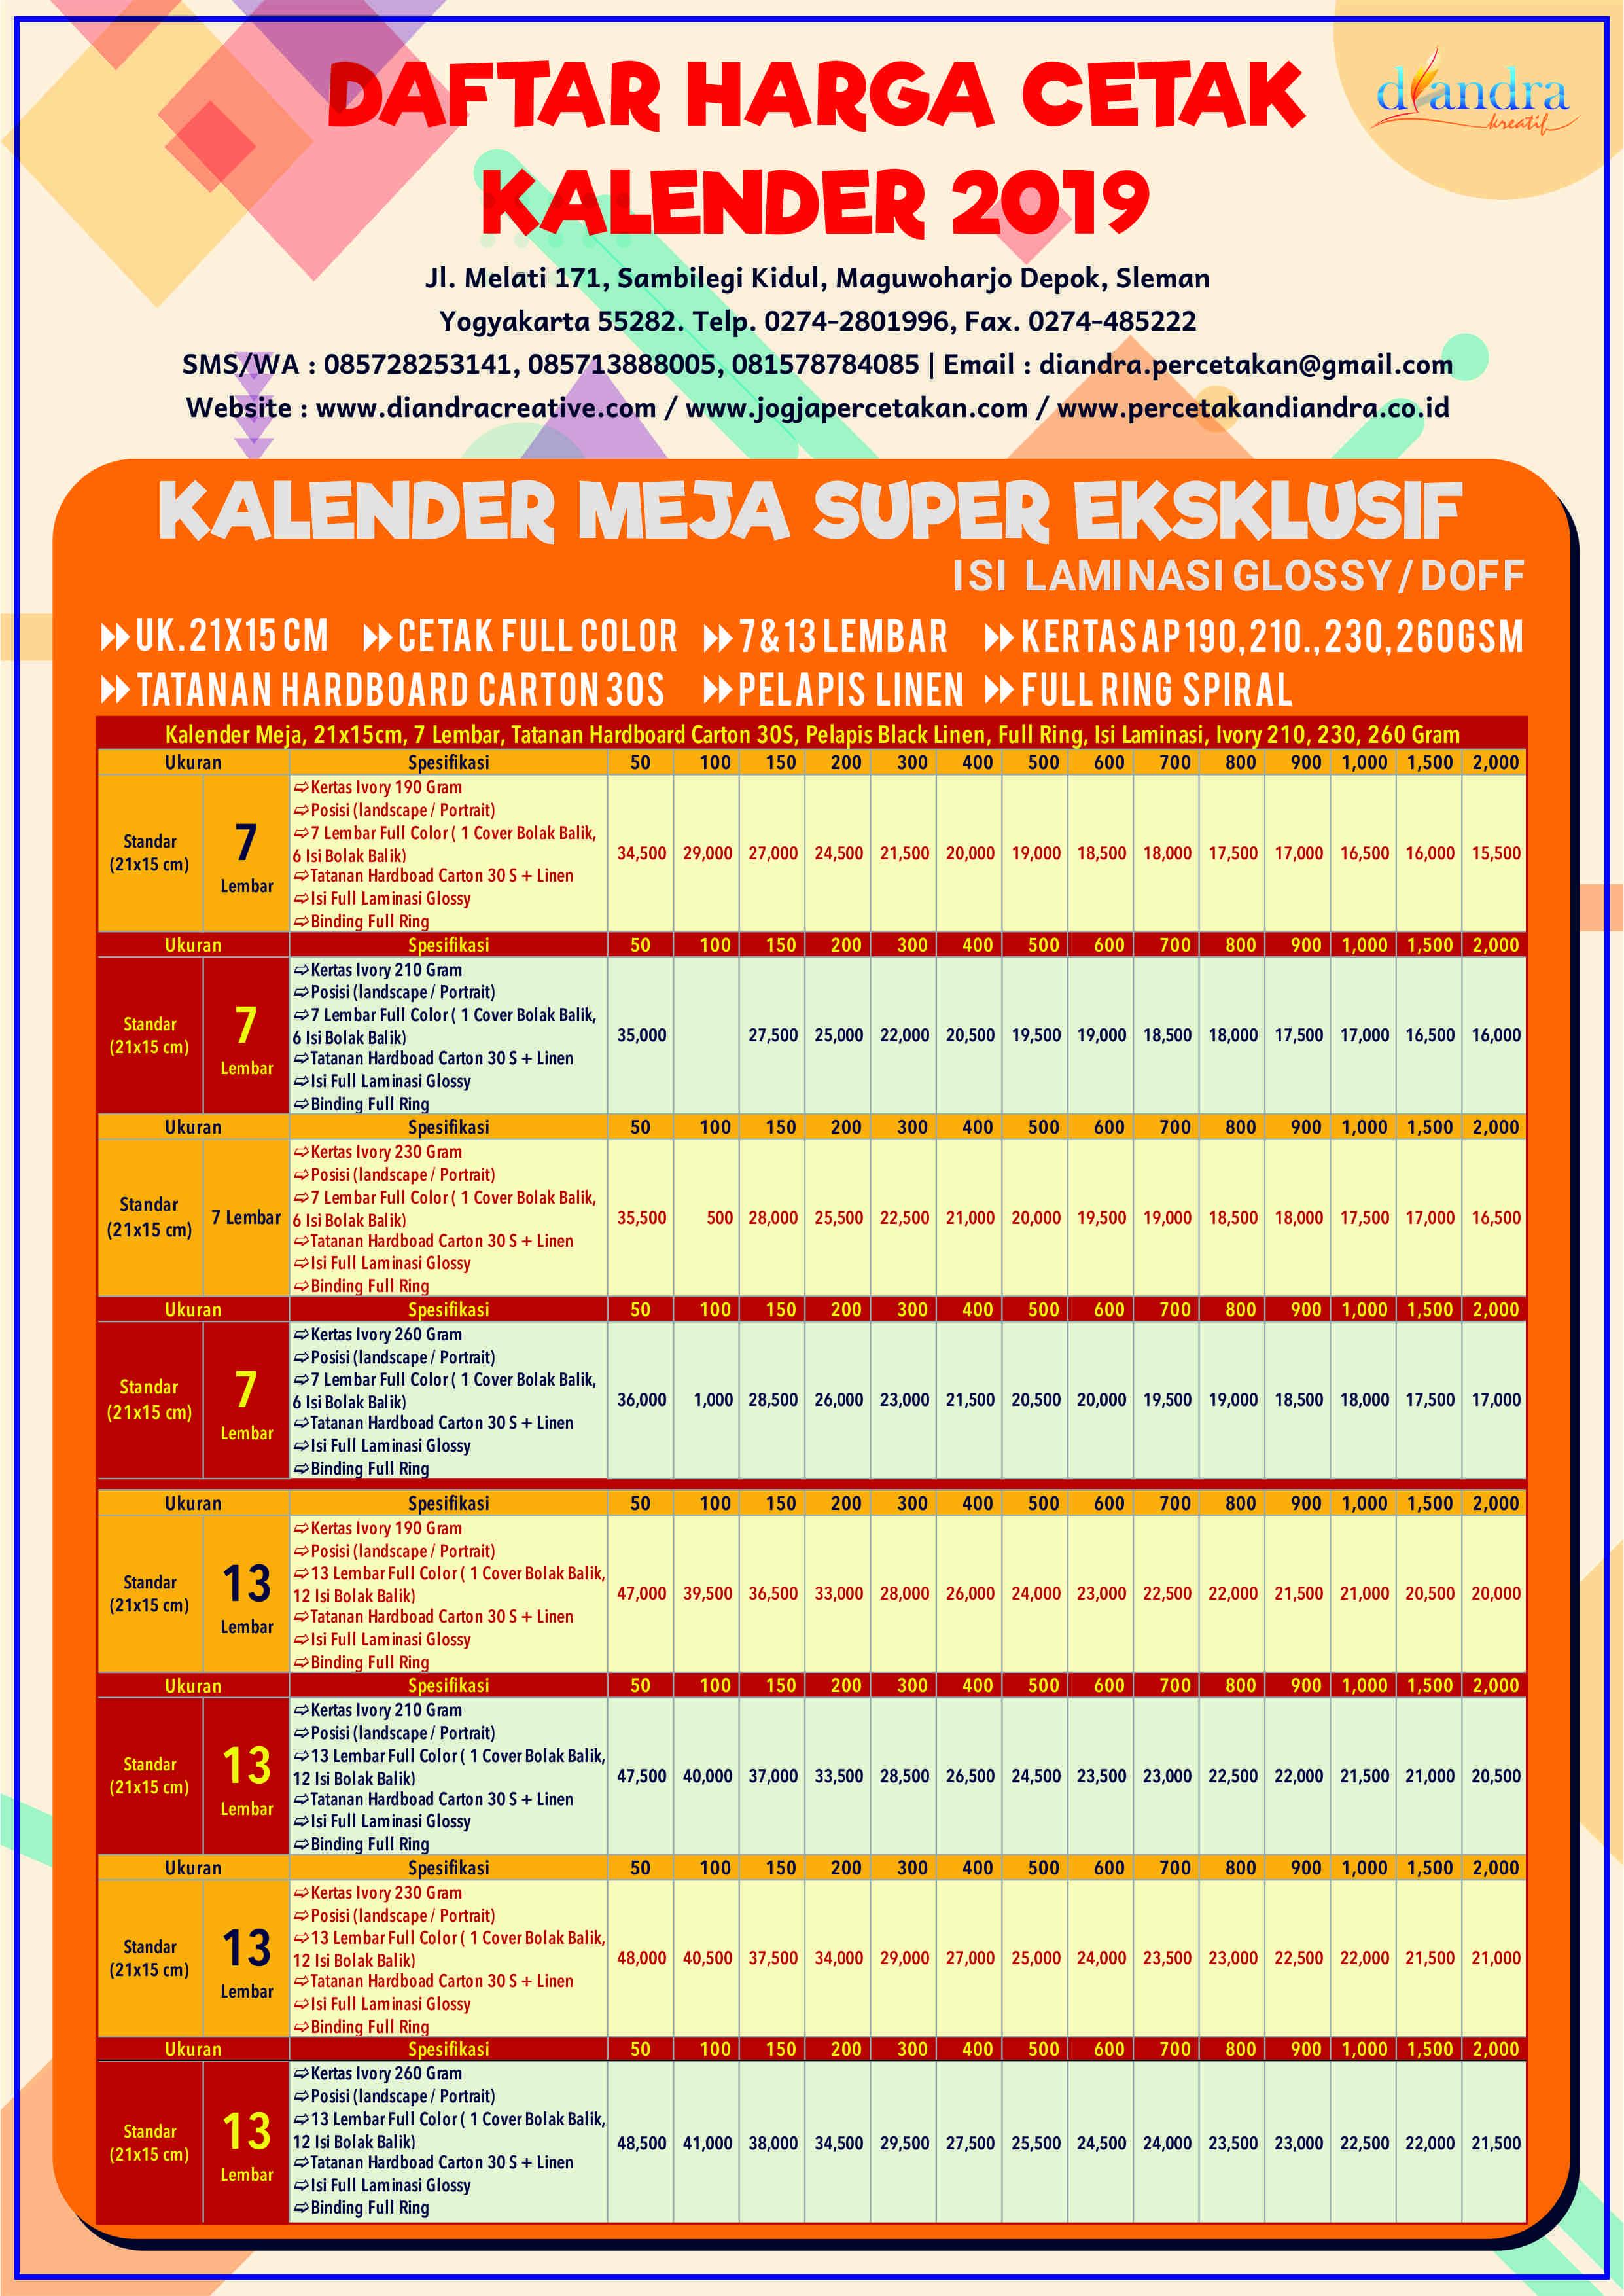 Kalender Meja Super Eksklusif